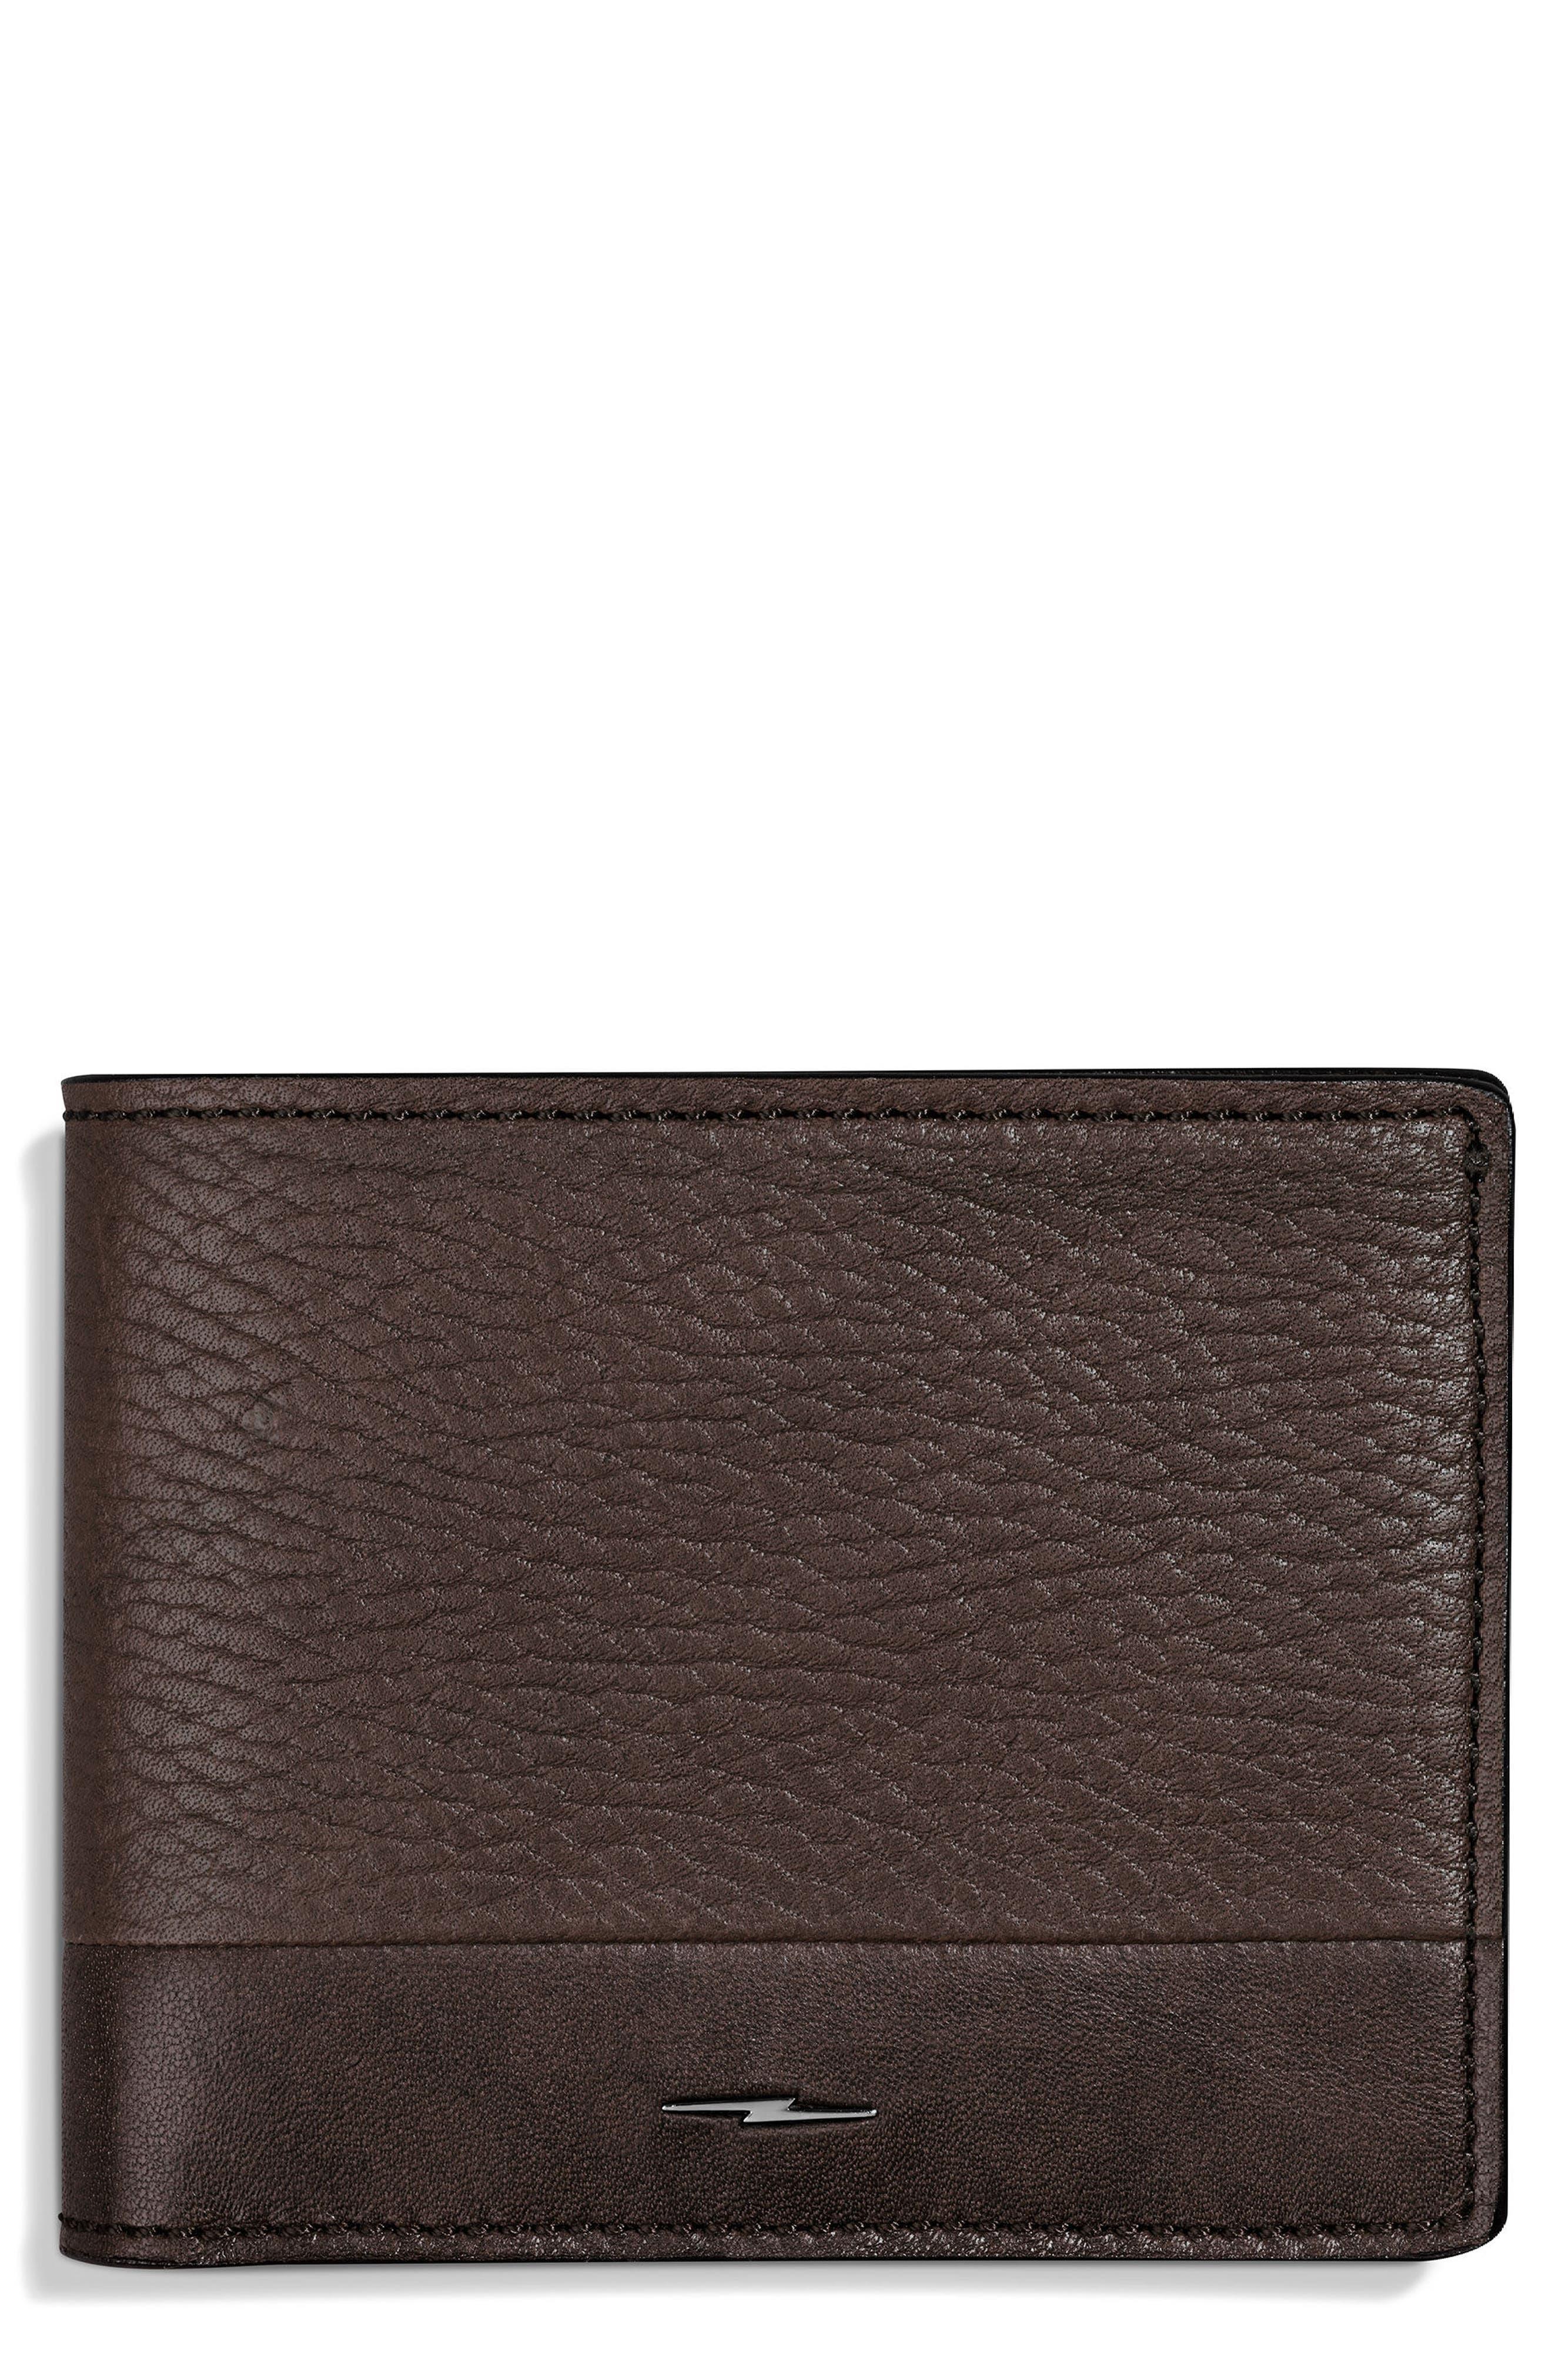 Bolt Leather Wallet,                             Main thumbnail 1, color,                             240